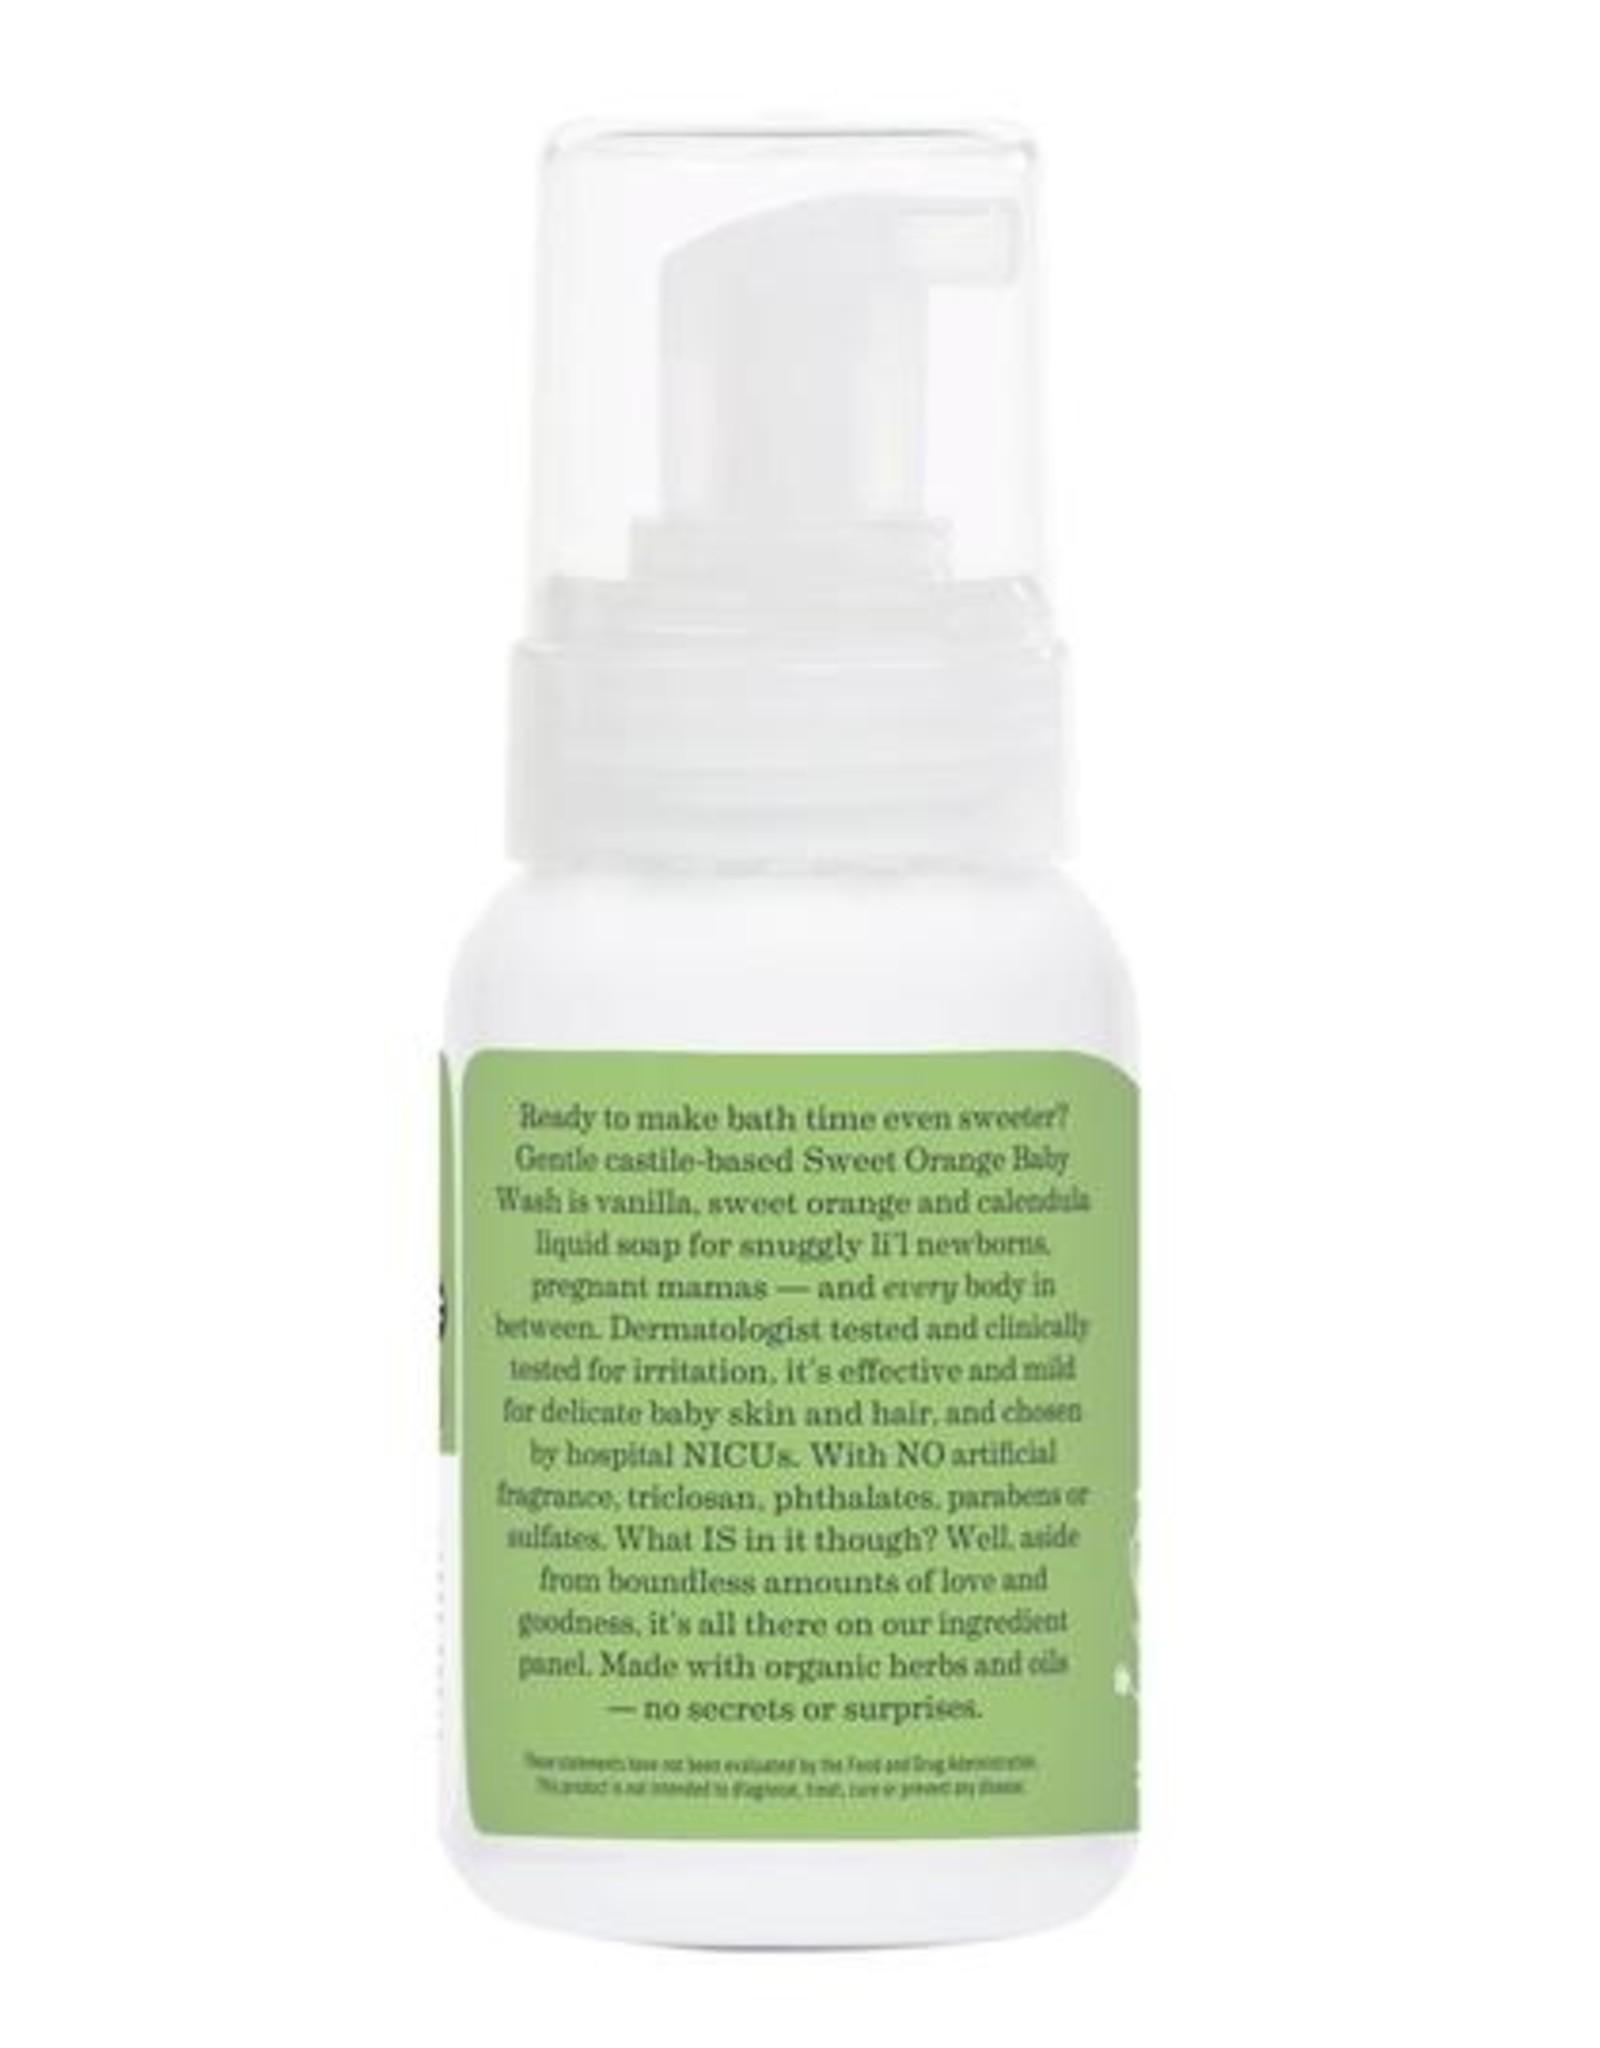 Earth Mama Organics Sweet Orange Baby Wash (5.3 fl. oz)